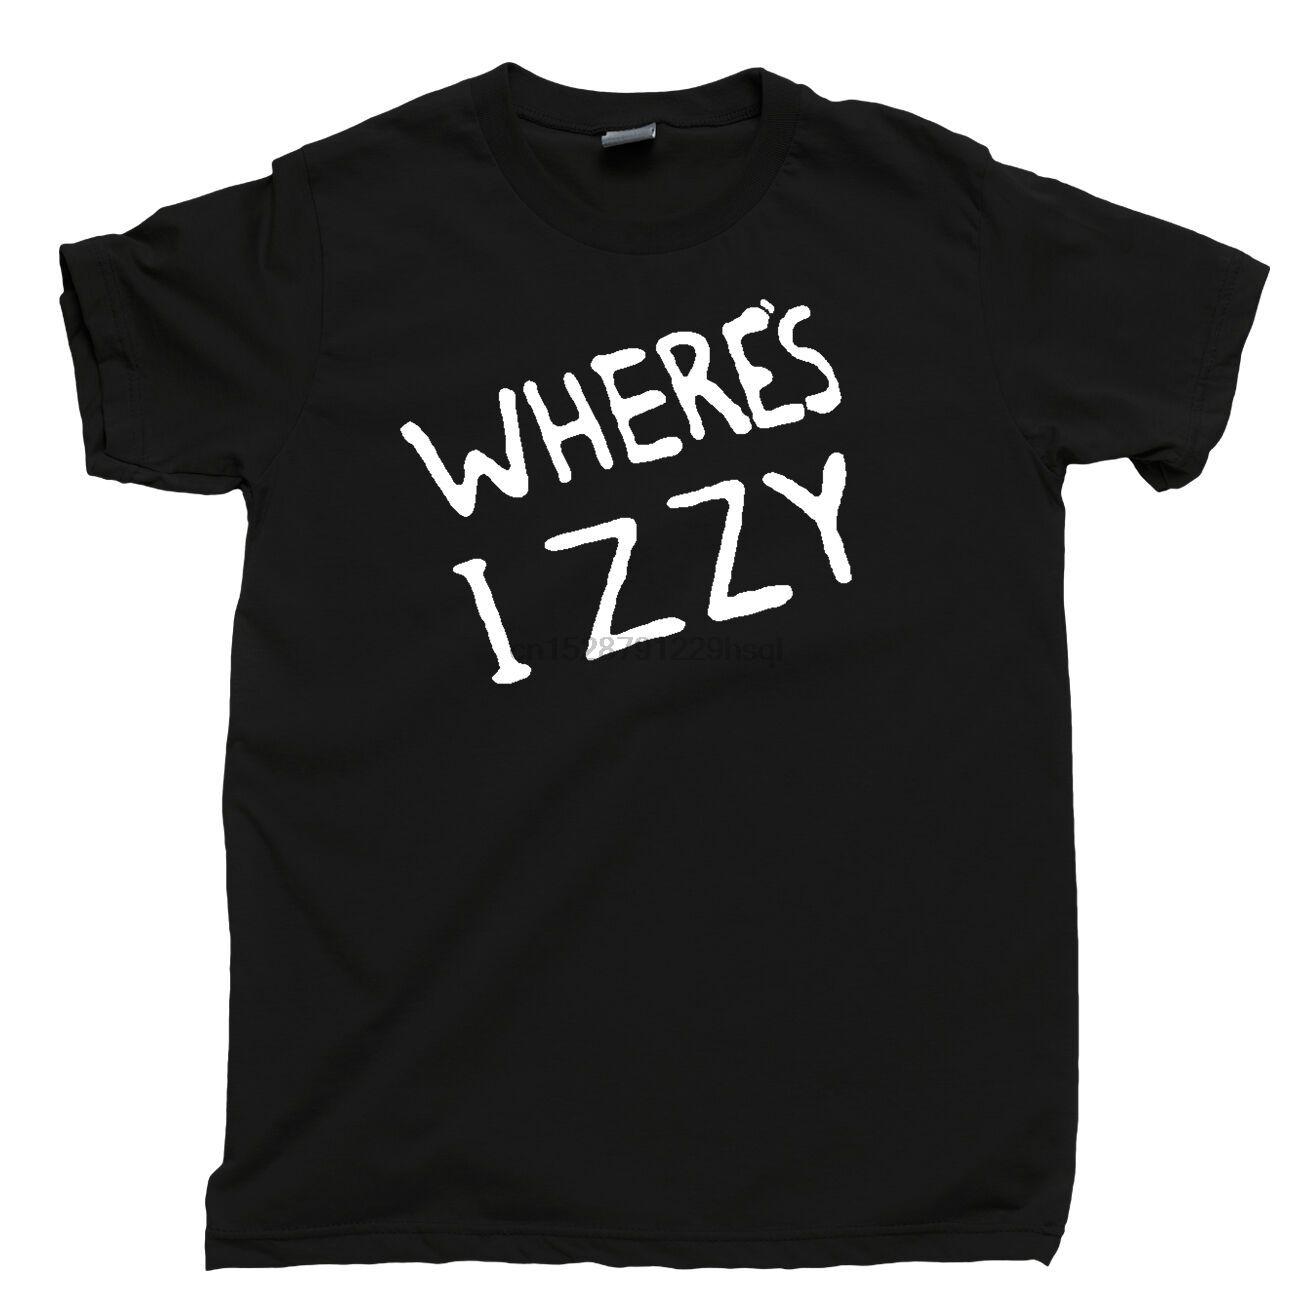 Wheres Izzy Stradlin Camiseta Axl Corte Dont Cry Tee